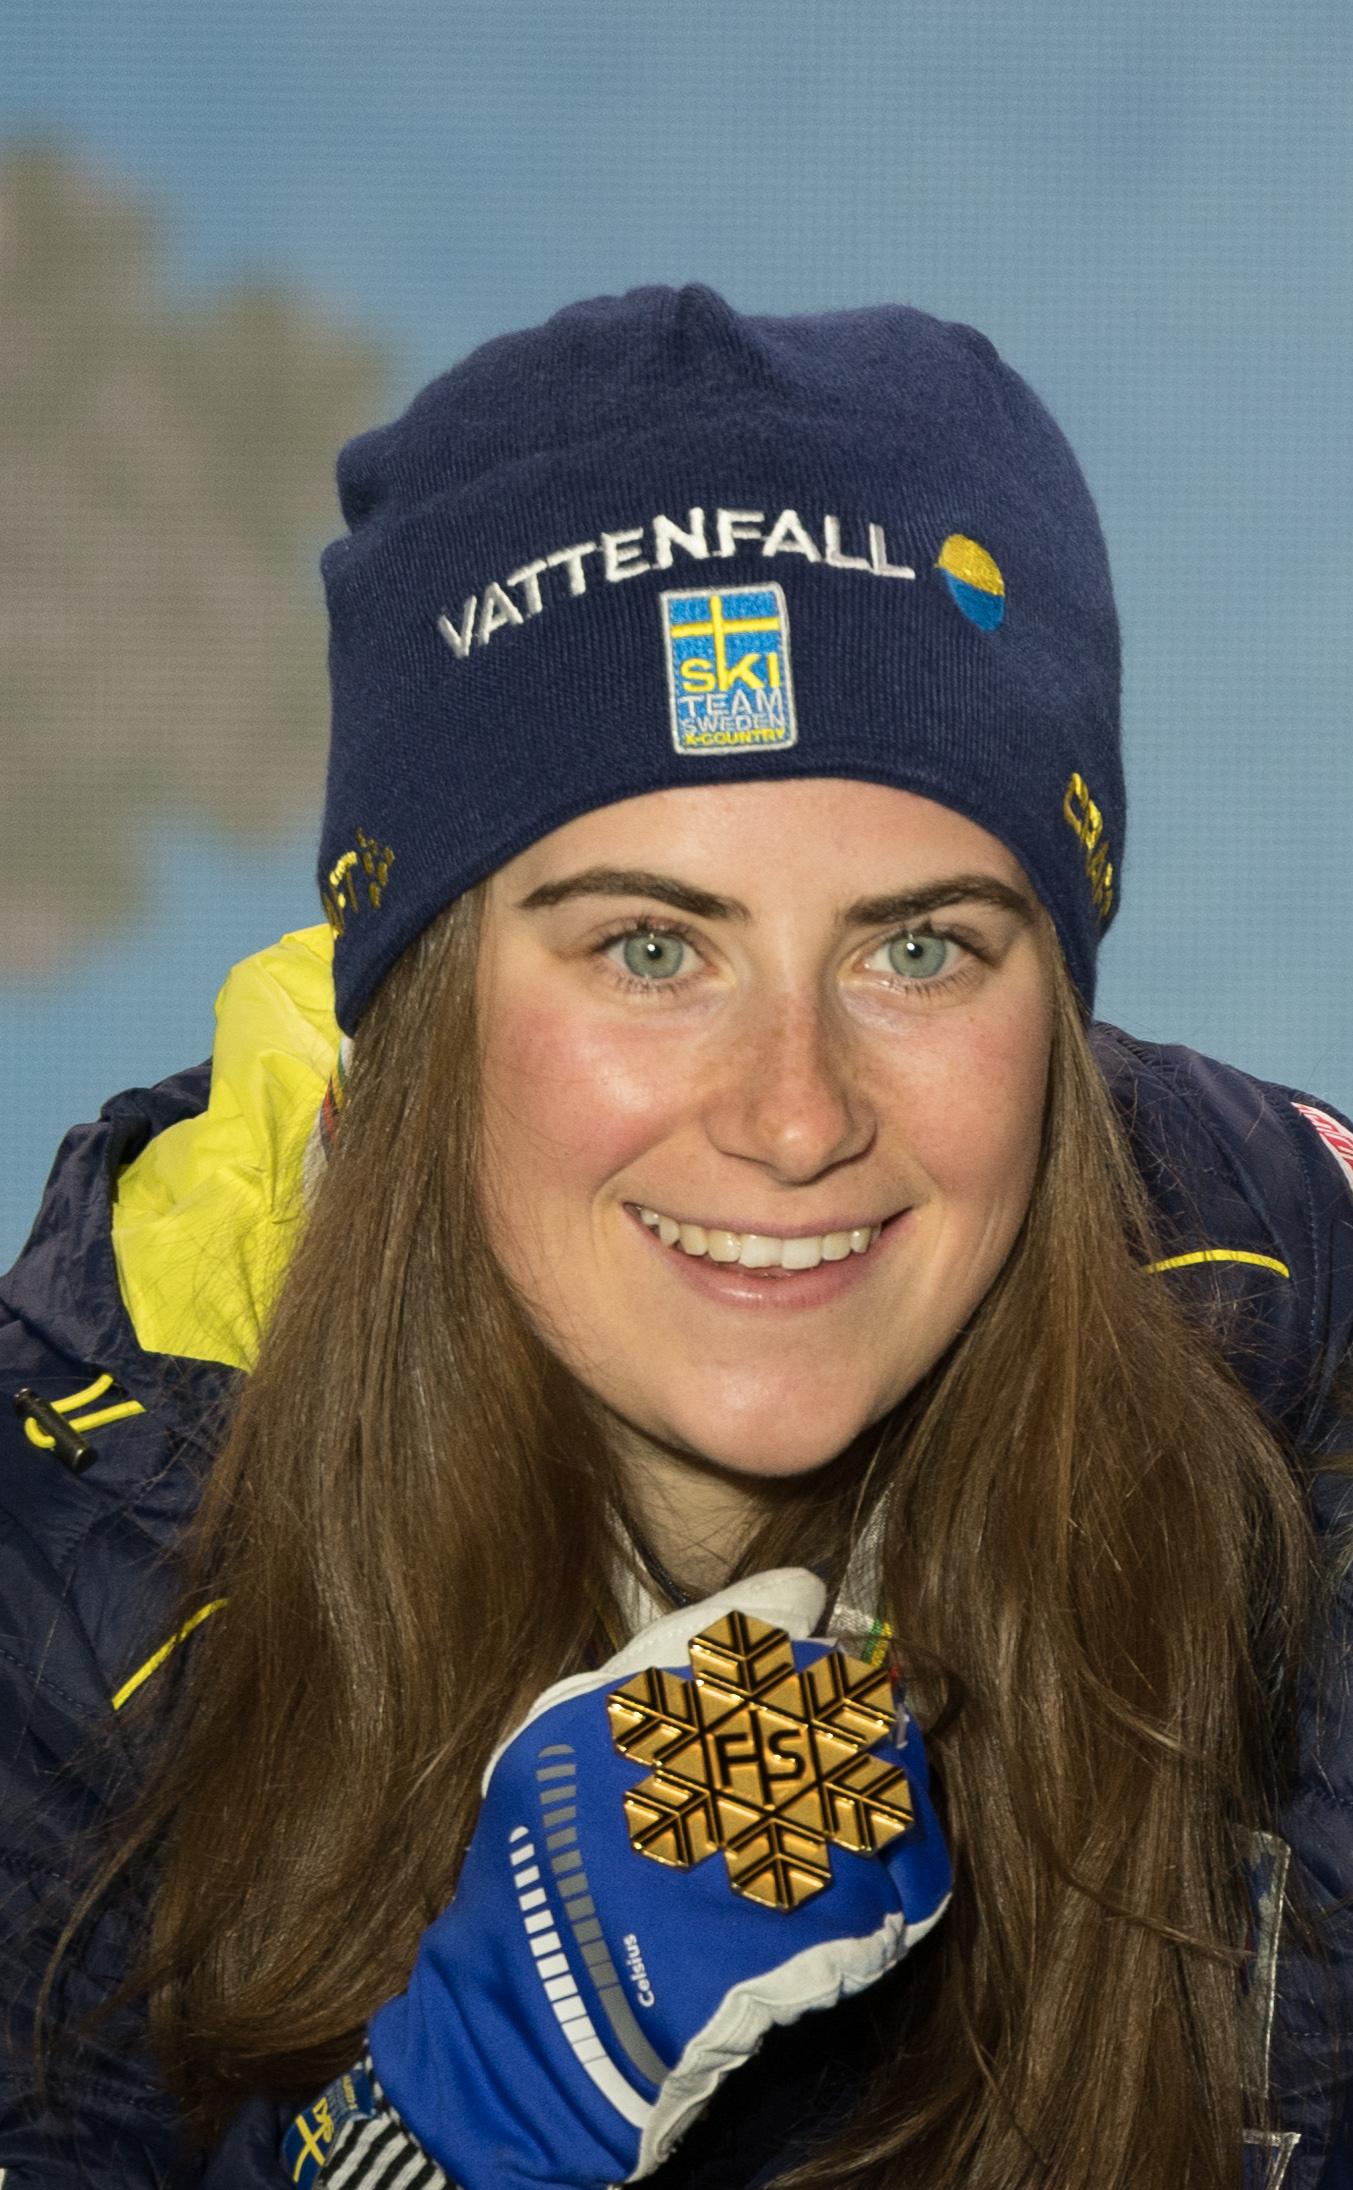 Kvinnliga Skidåkare Sverige